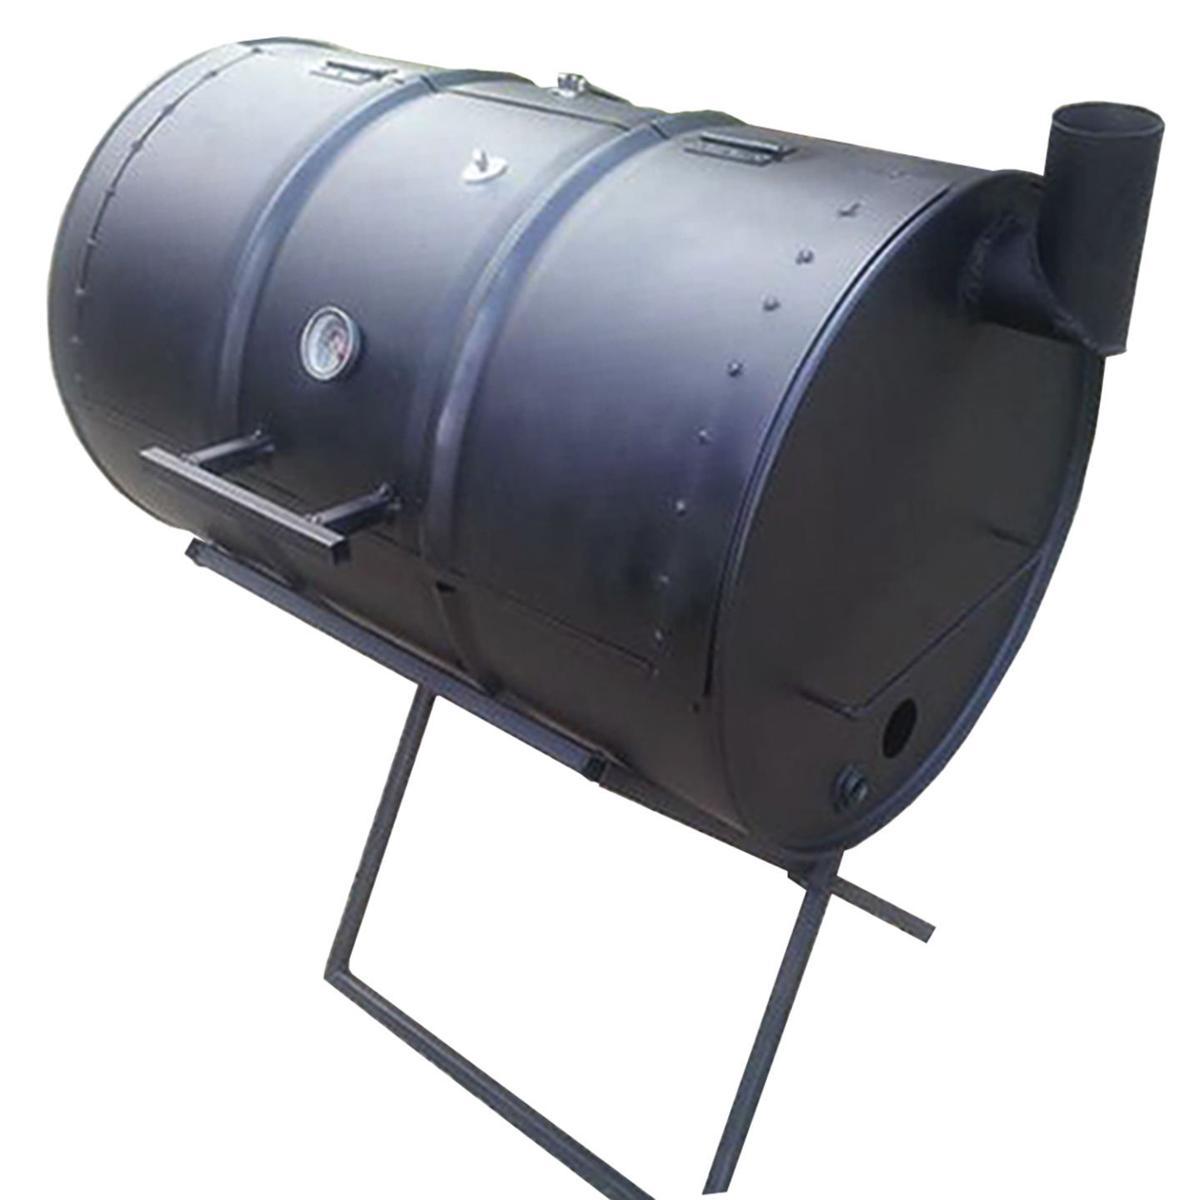 Weekend Warrior: DIY oil-drum BBQ smoker